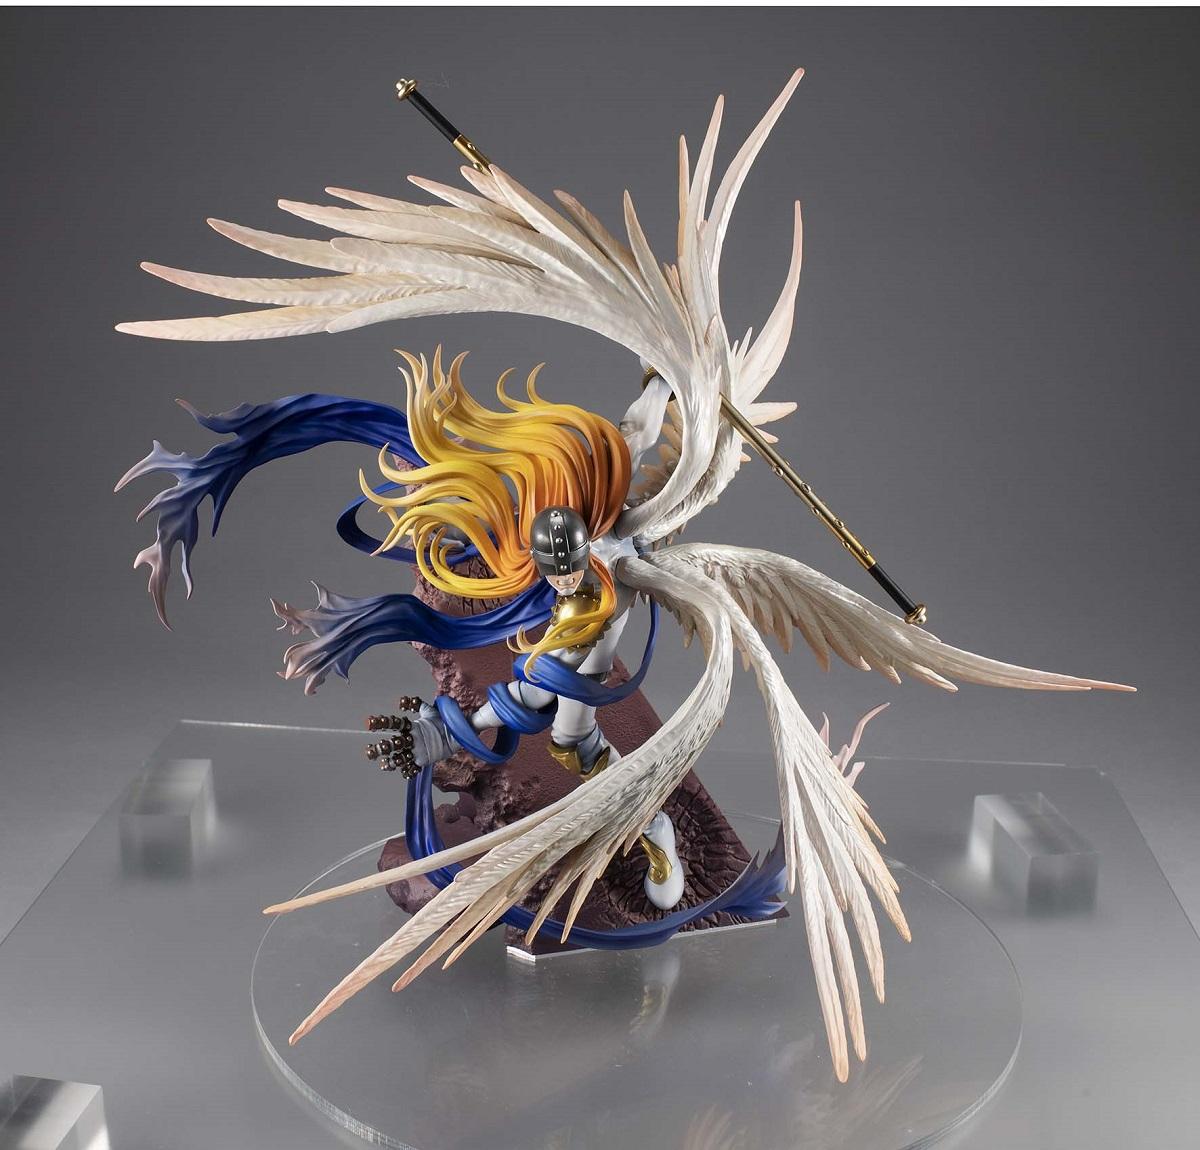 Angemon 20th Anniversary Ver Digimon Adventure Precious GEM Series Figure